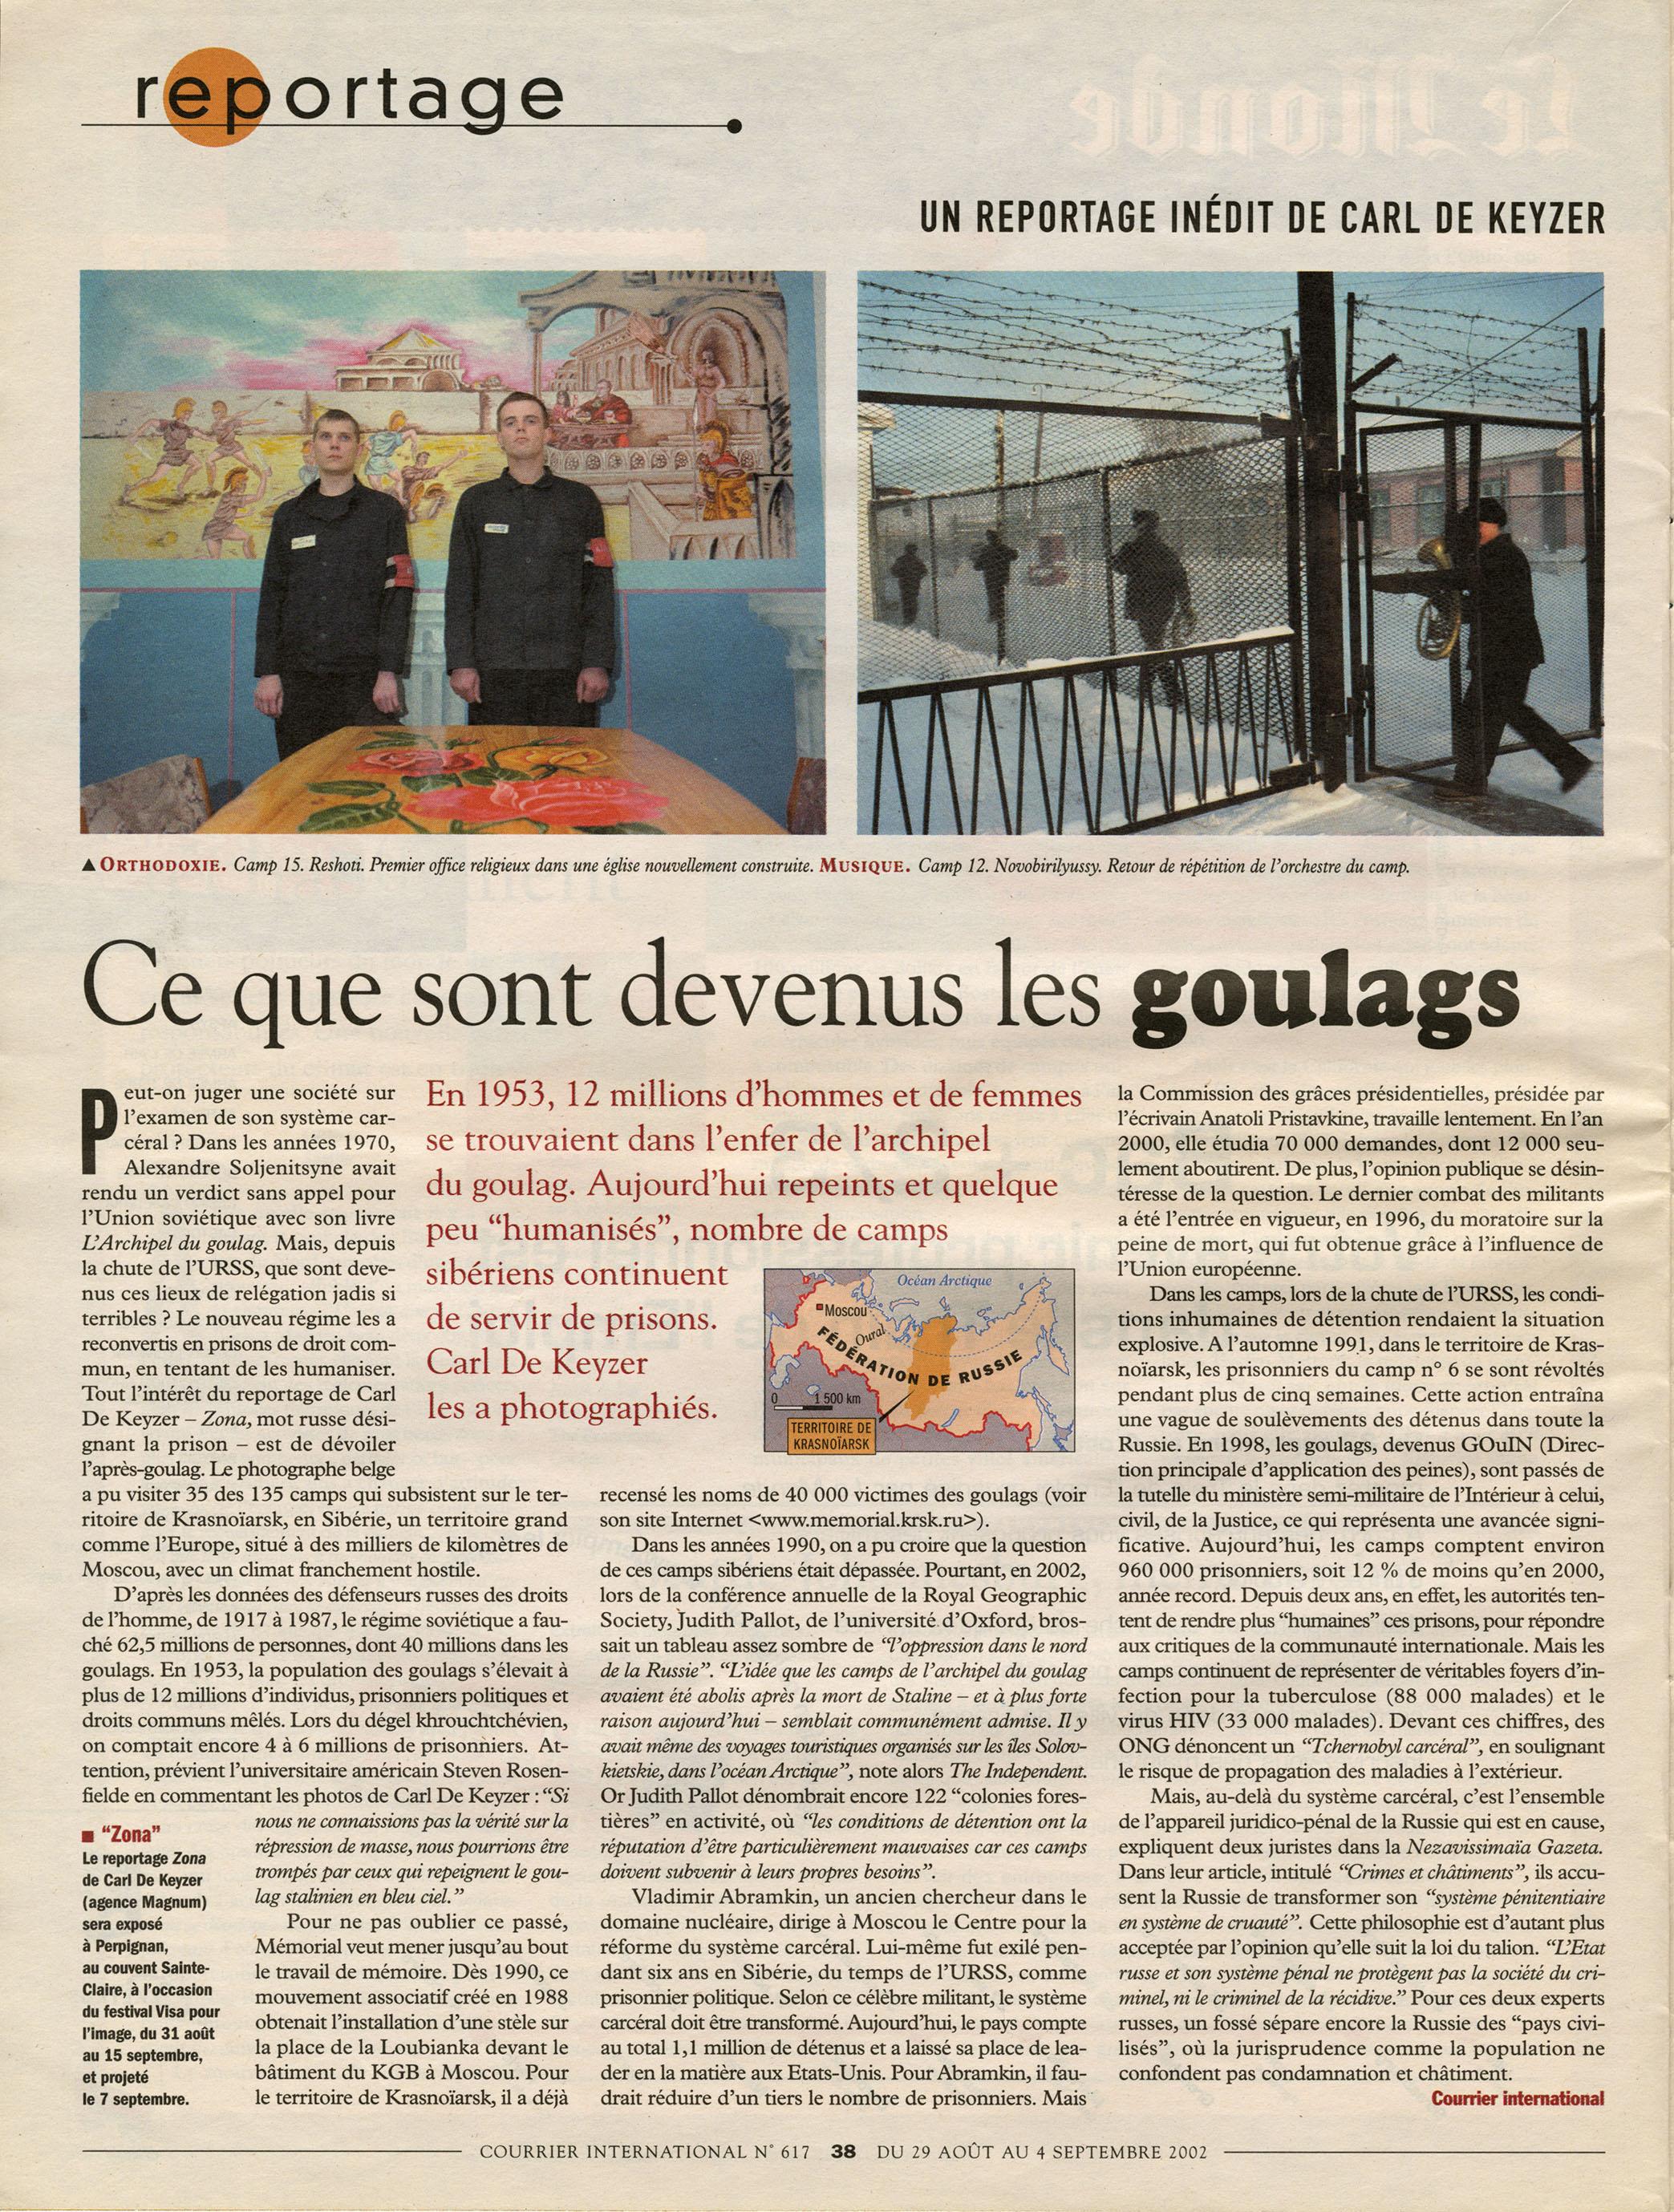 Courrier International (Zona)